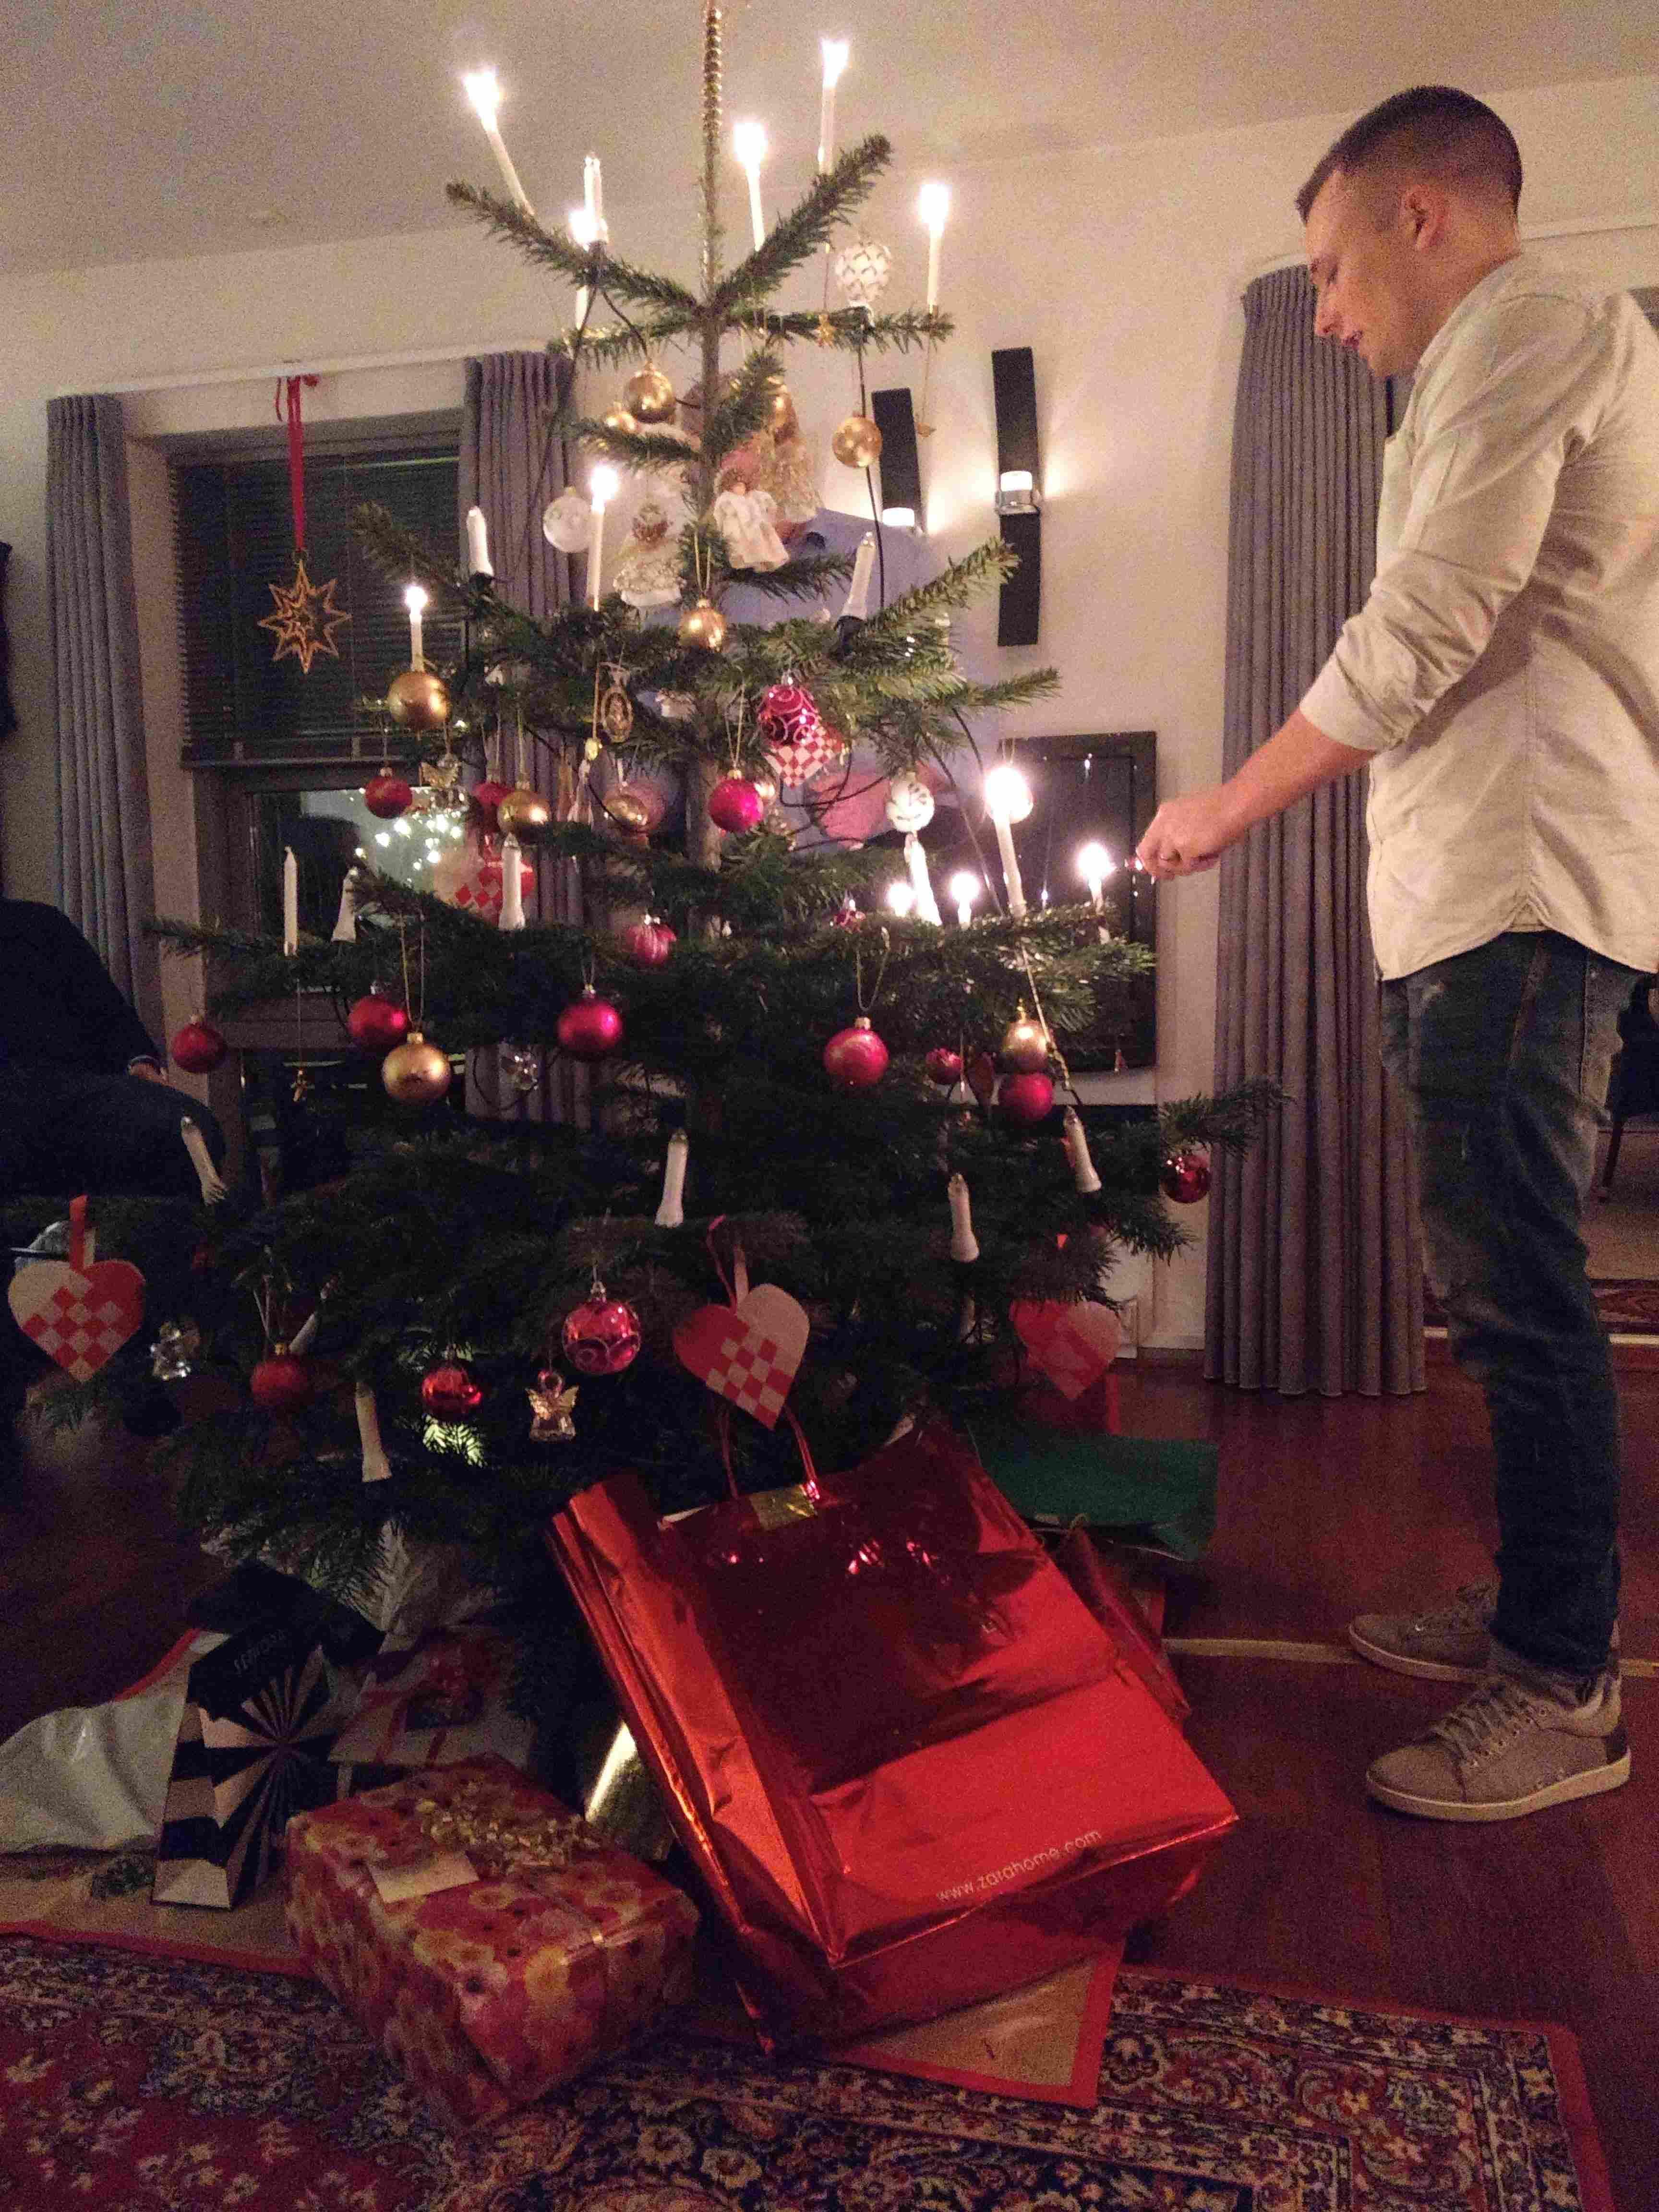 Natal na Dinamarca: ritual de acender as velas da árvore de Natal